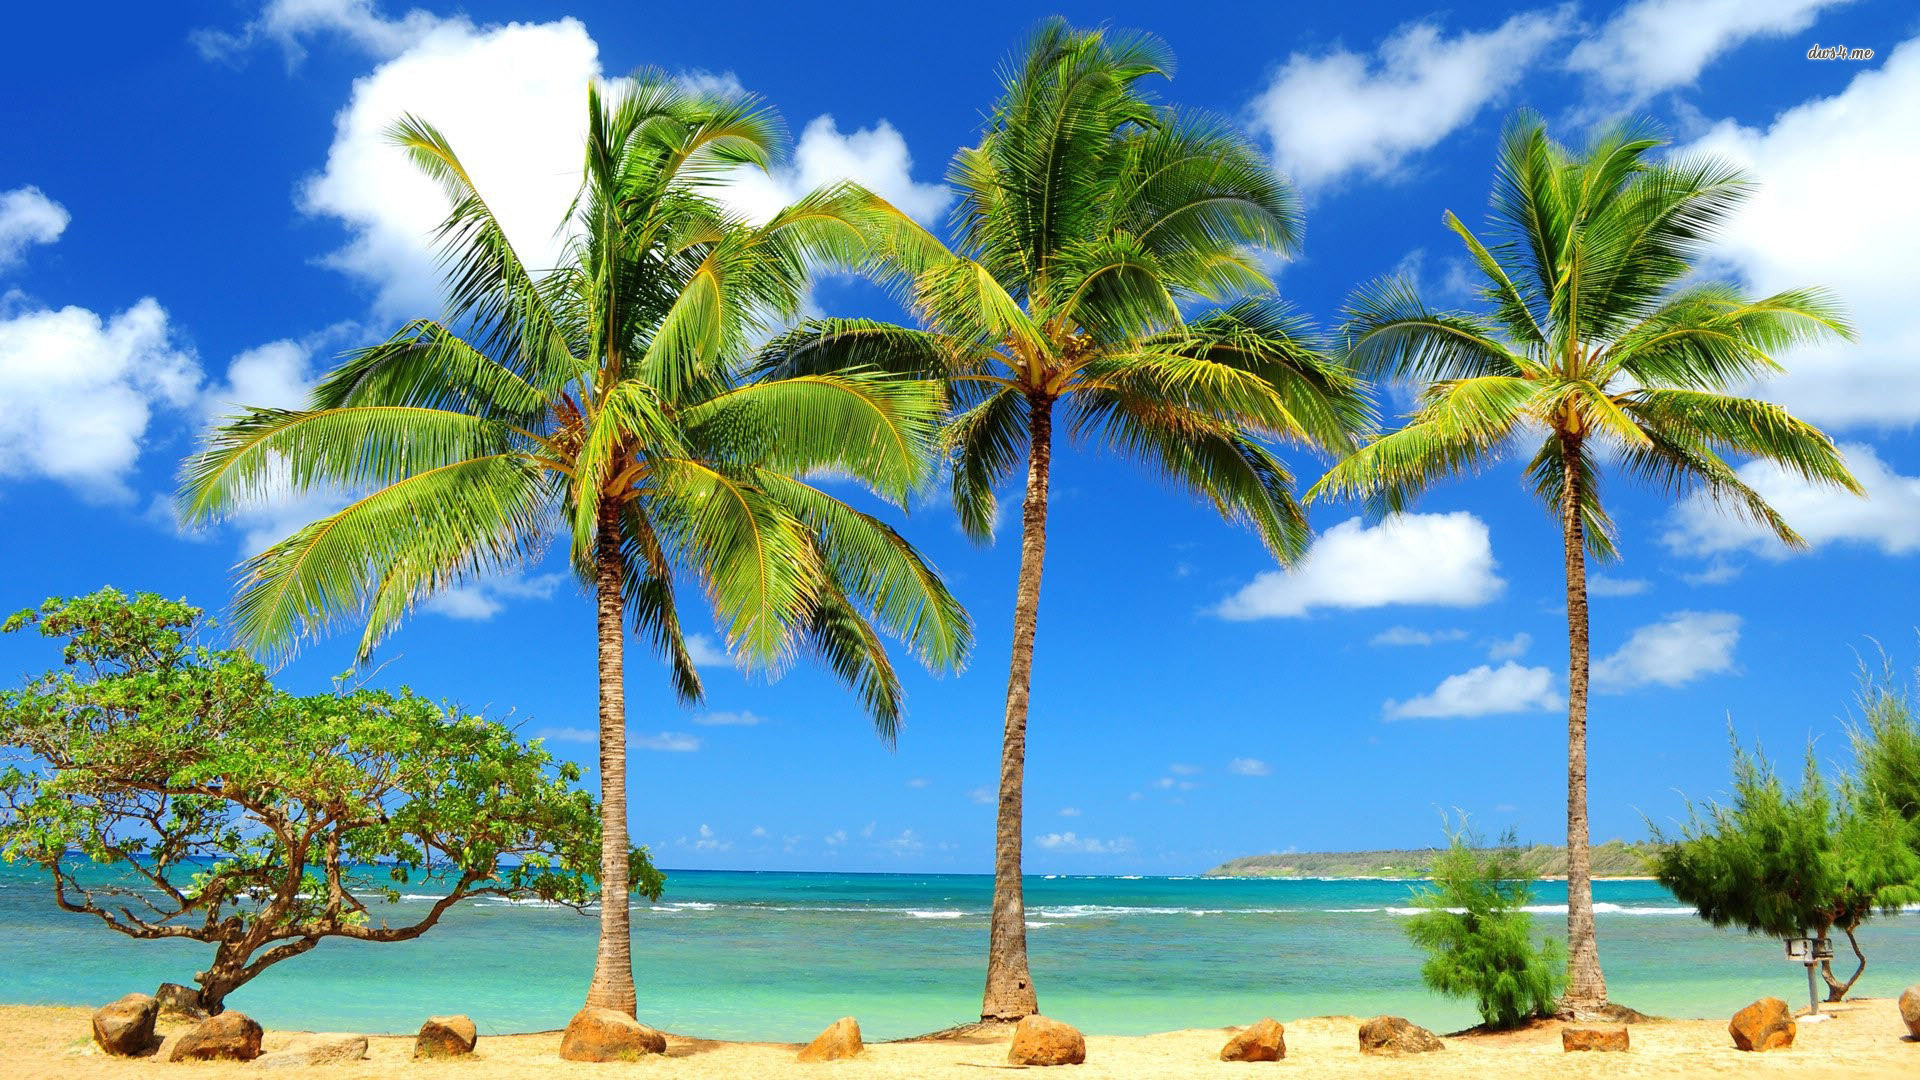 palm trees Desktop Backgrounds for HD Wallpaper wall  artcom 1920x1080